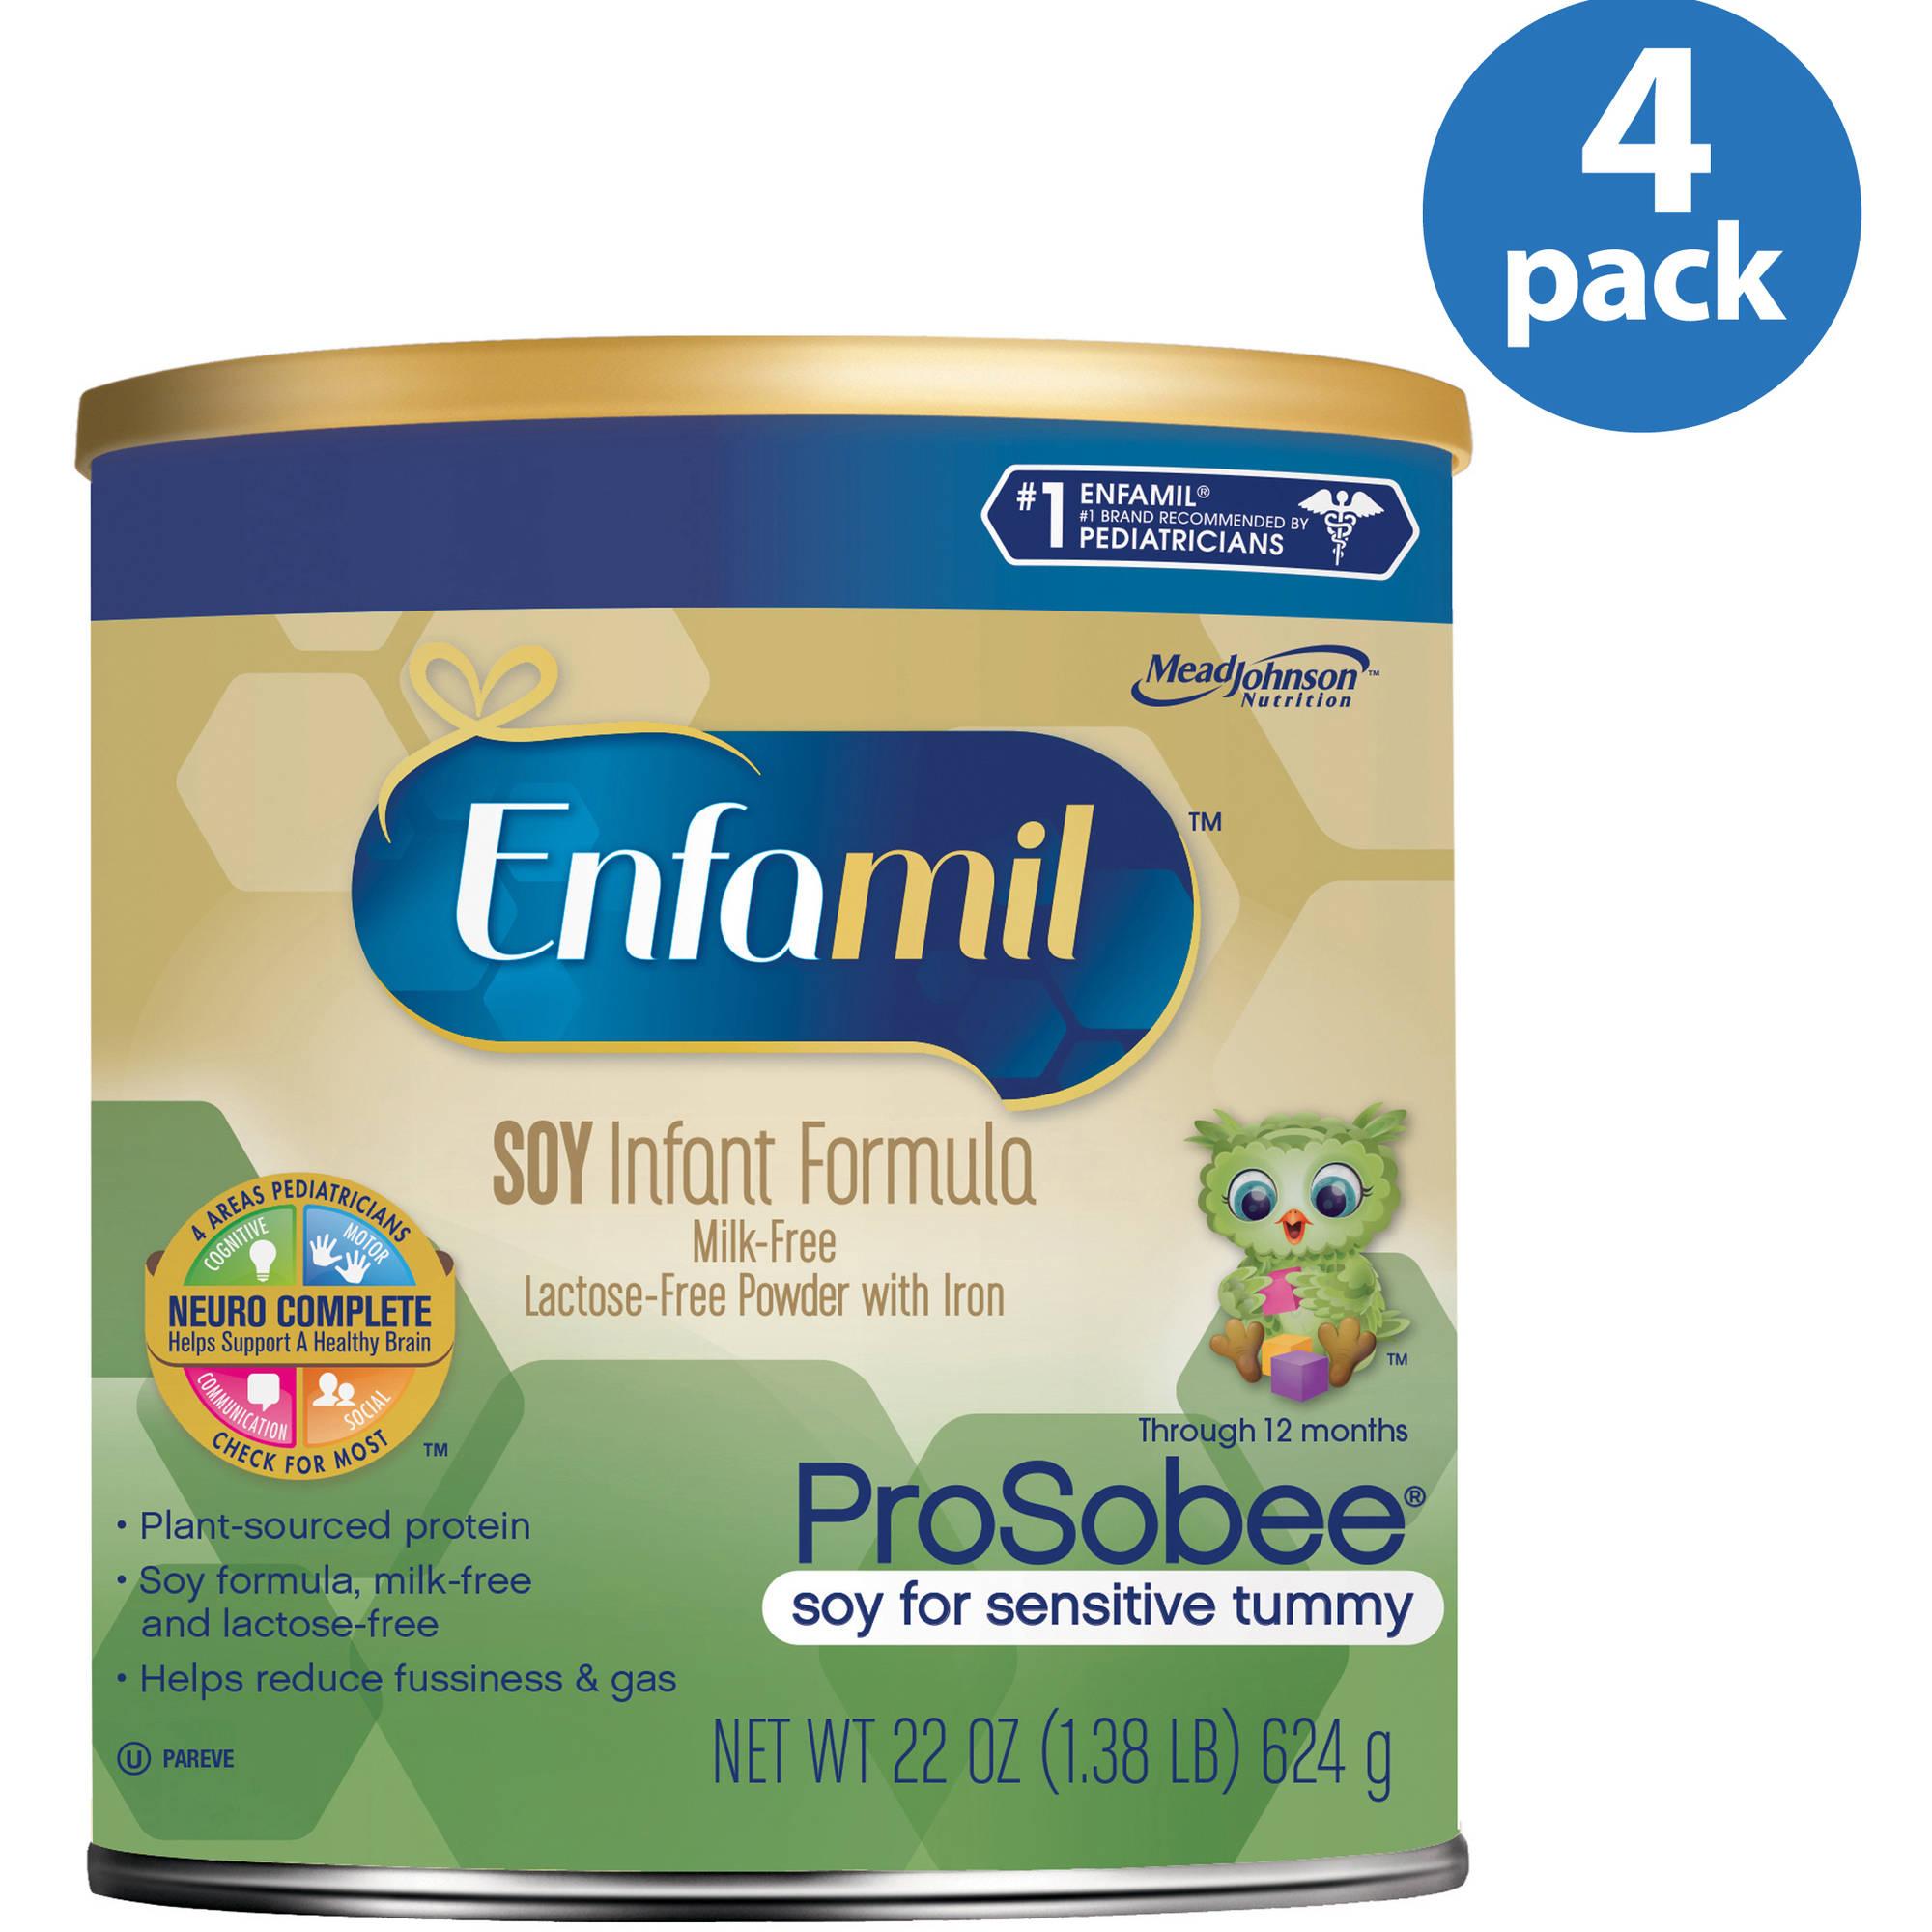 Enfamil Prosobee soy baby formula - 22 oz Powder Can (Pack of 4)